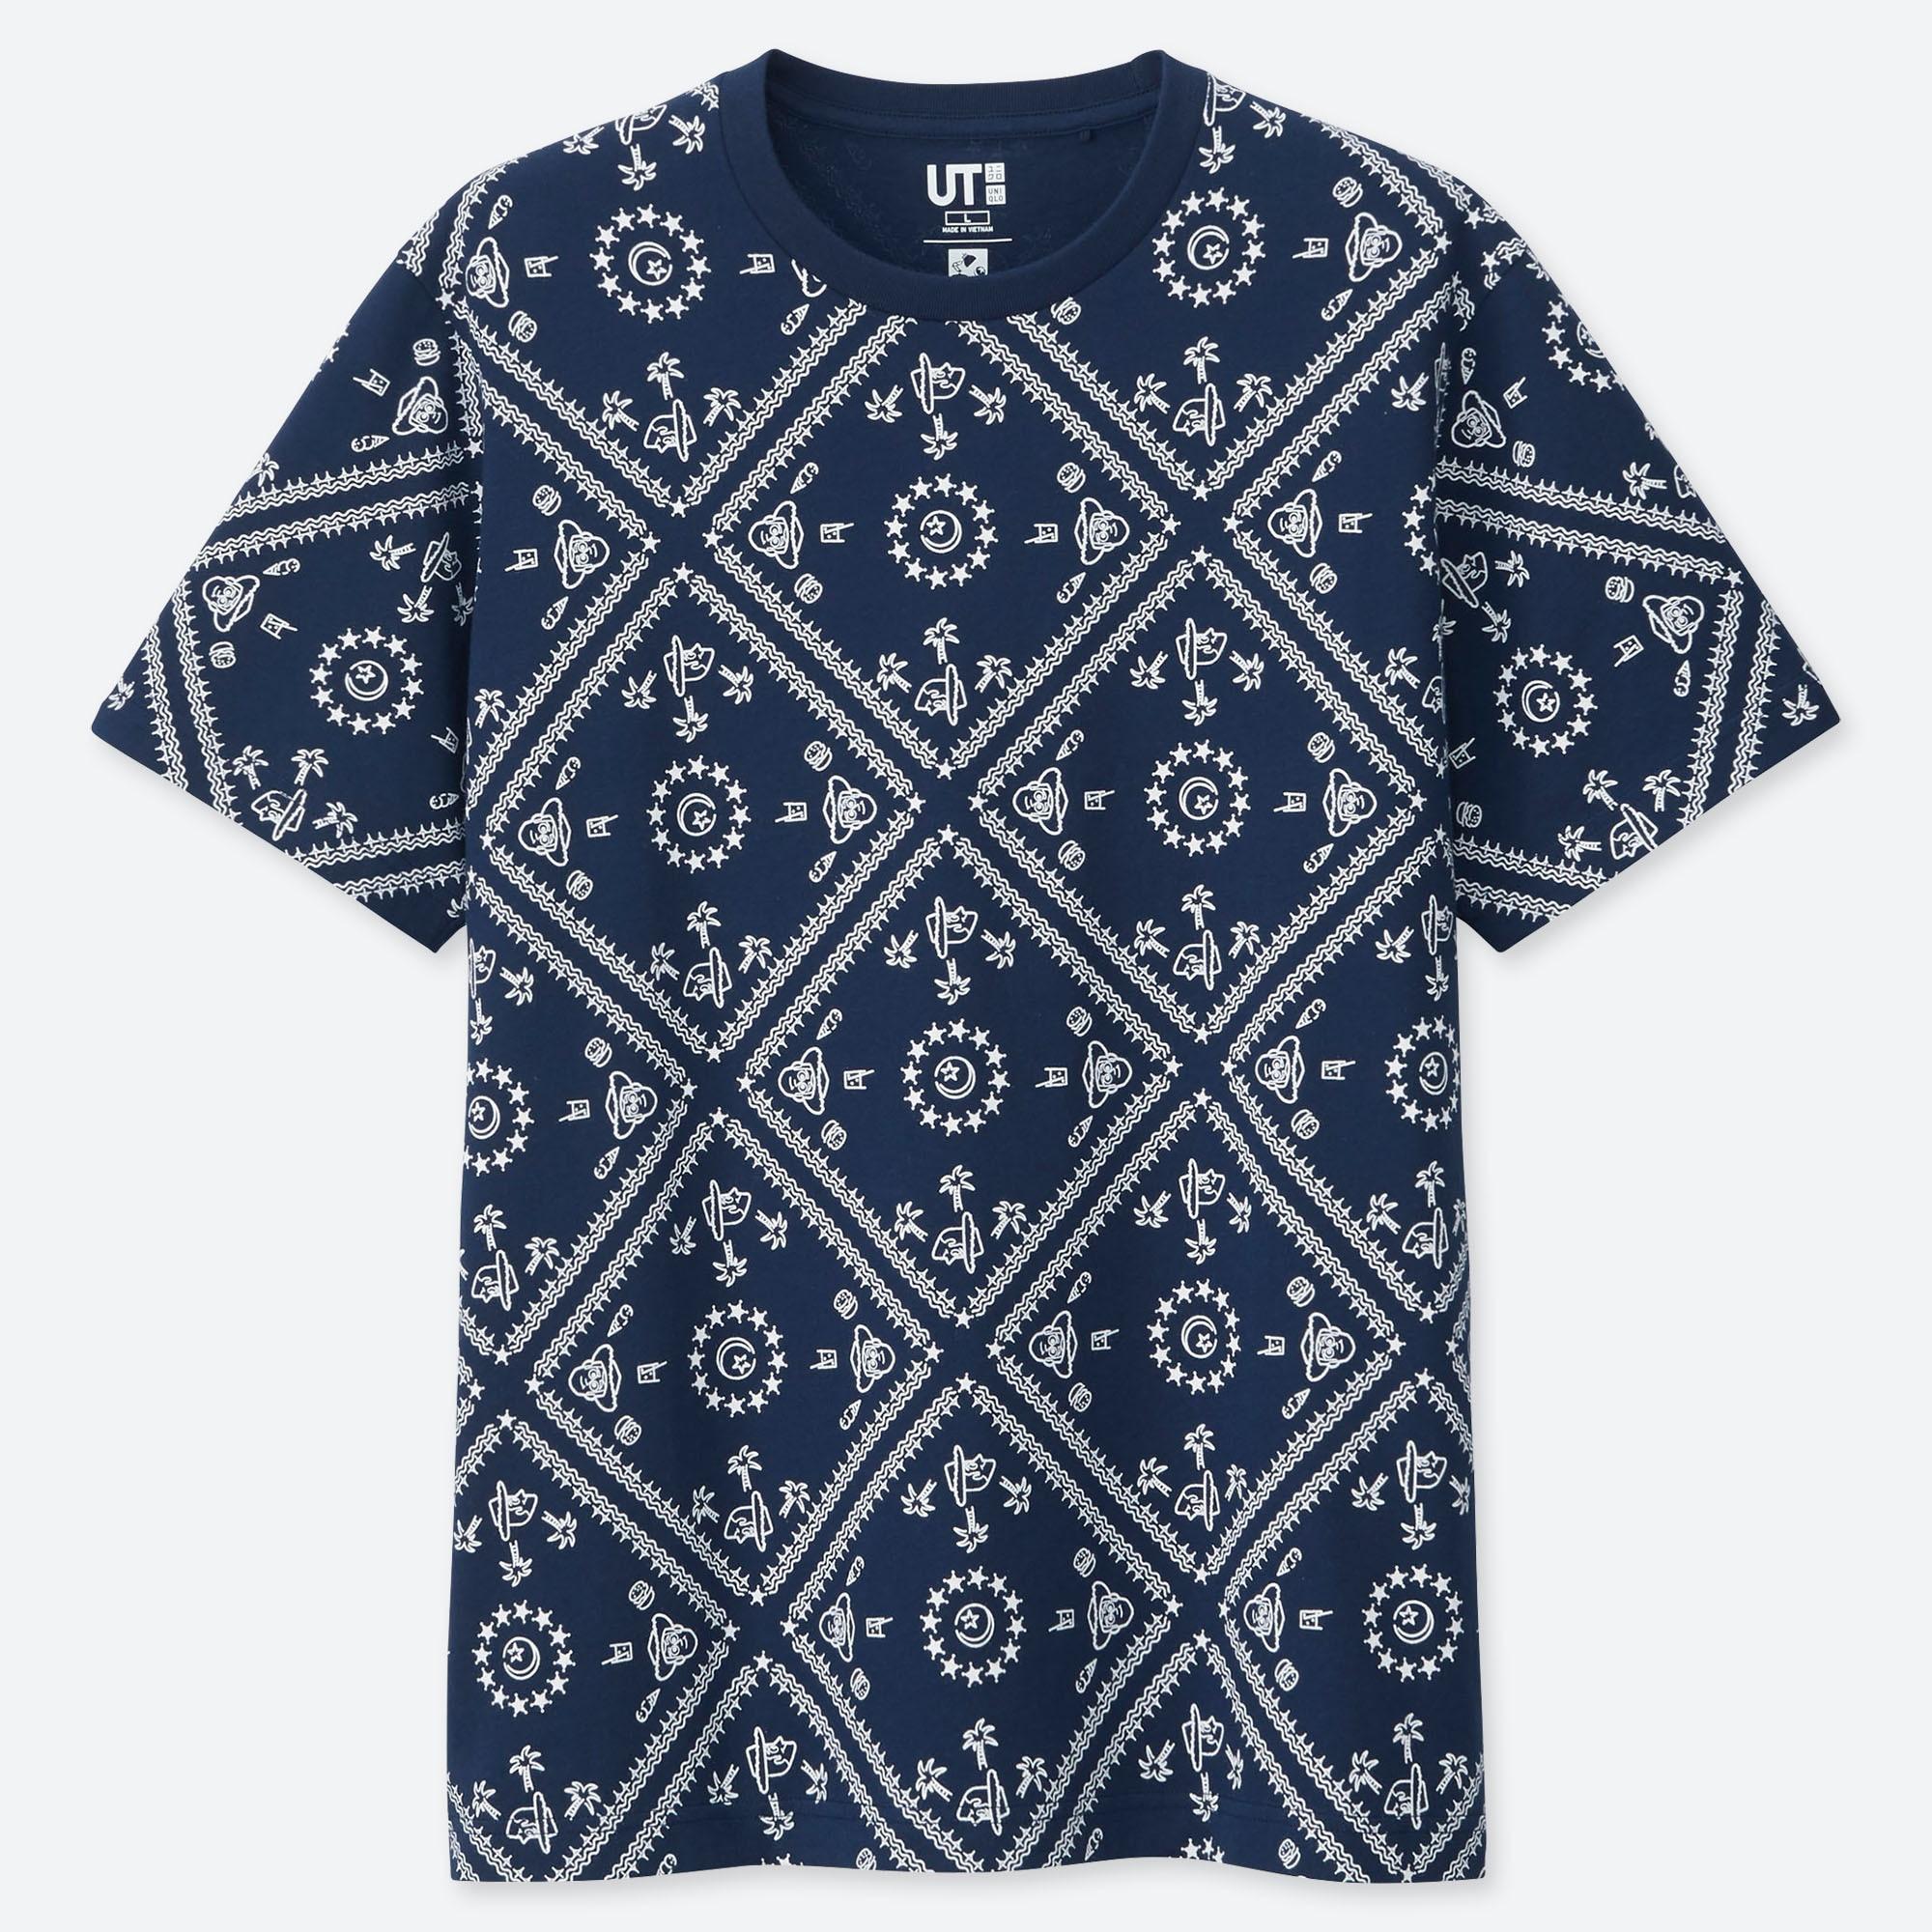 Neu Damen Langarm Spitzen Lace Bluse Tunika Shirts Top Hemd Oberteil 32-48 DT66